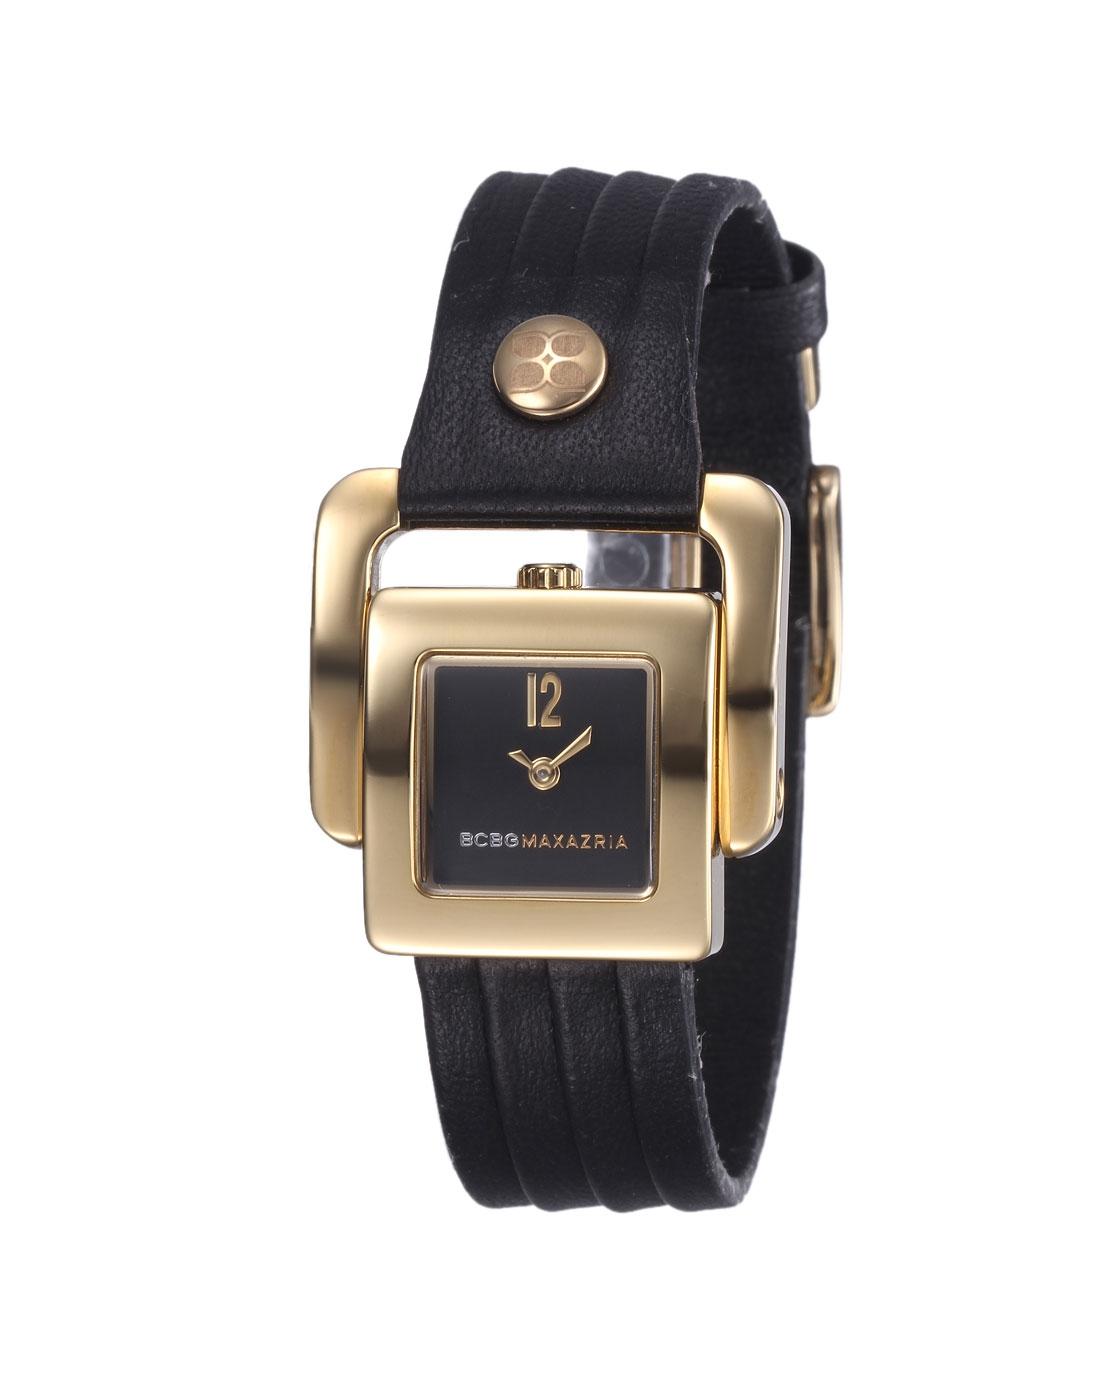 bcbg黑色时尚方形手表ibg6231-黑色